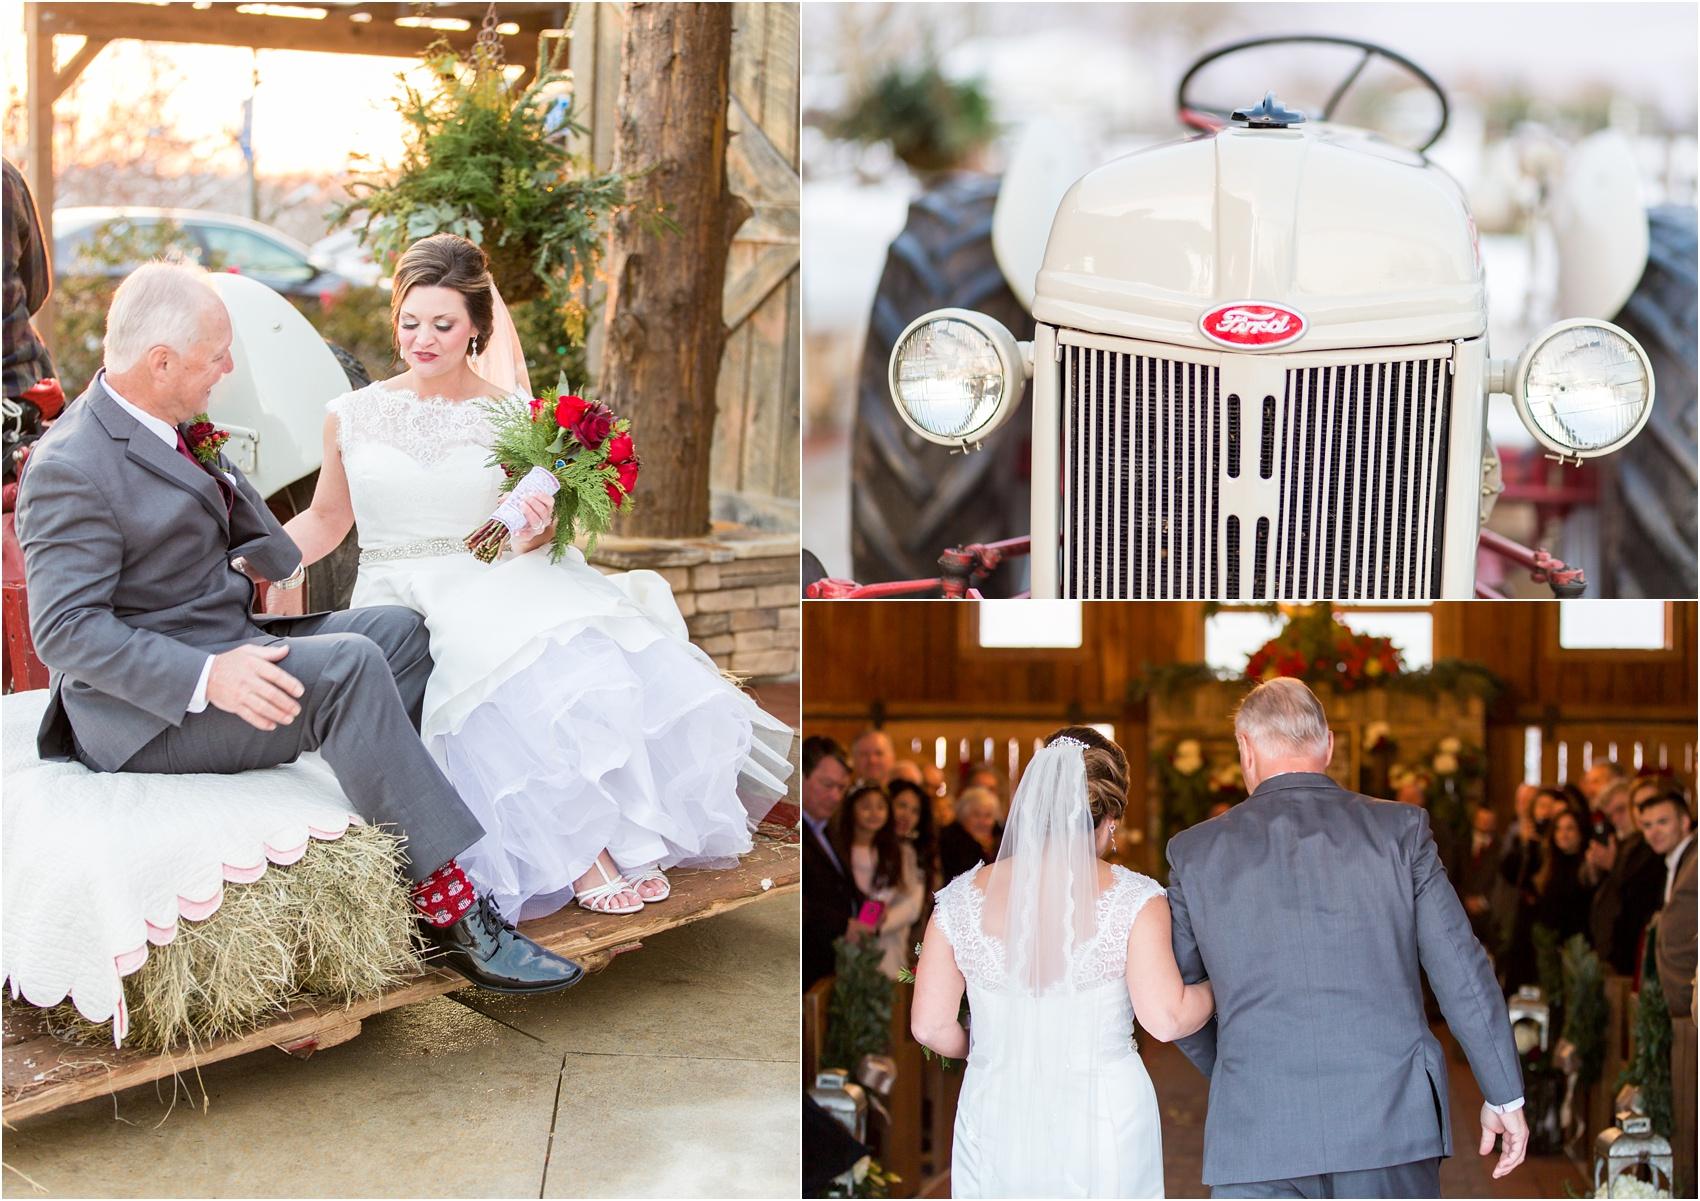 Savannah Eve Photography- Page Wedding Blog-67.jpg